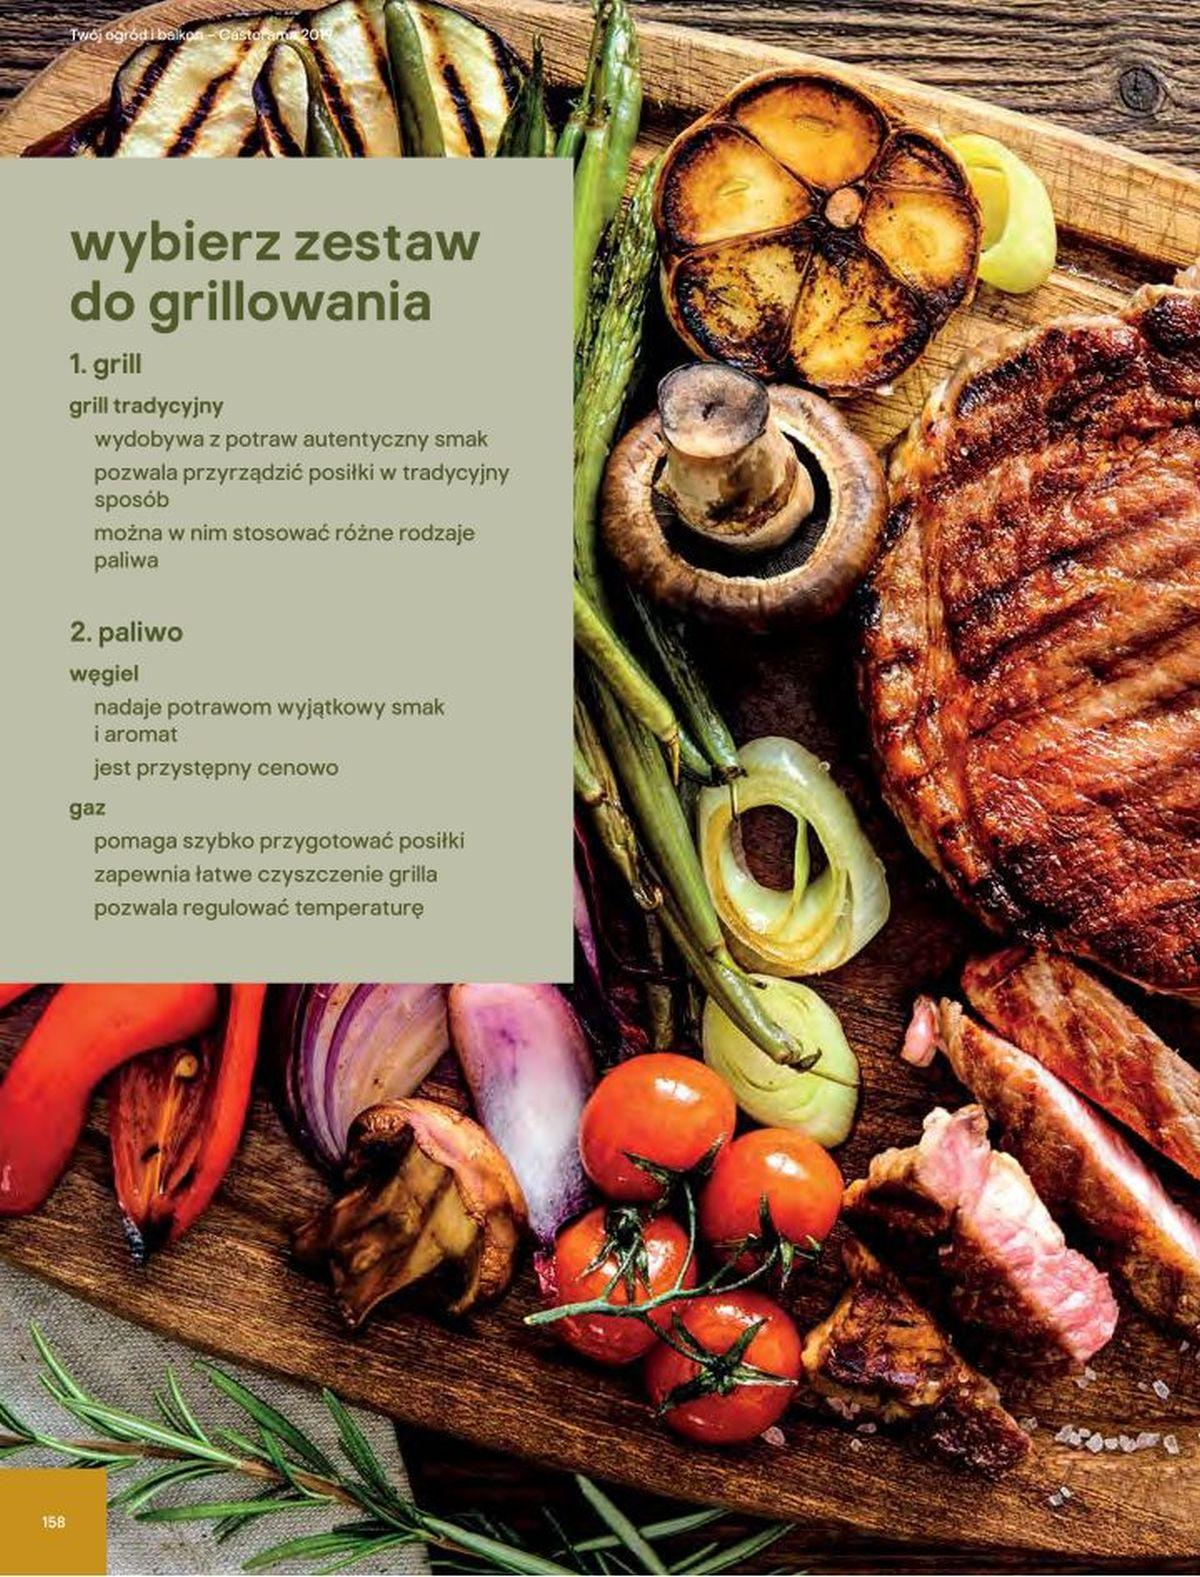 Gazetka promocyjna Castorama do 31/12/2019 str.151